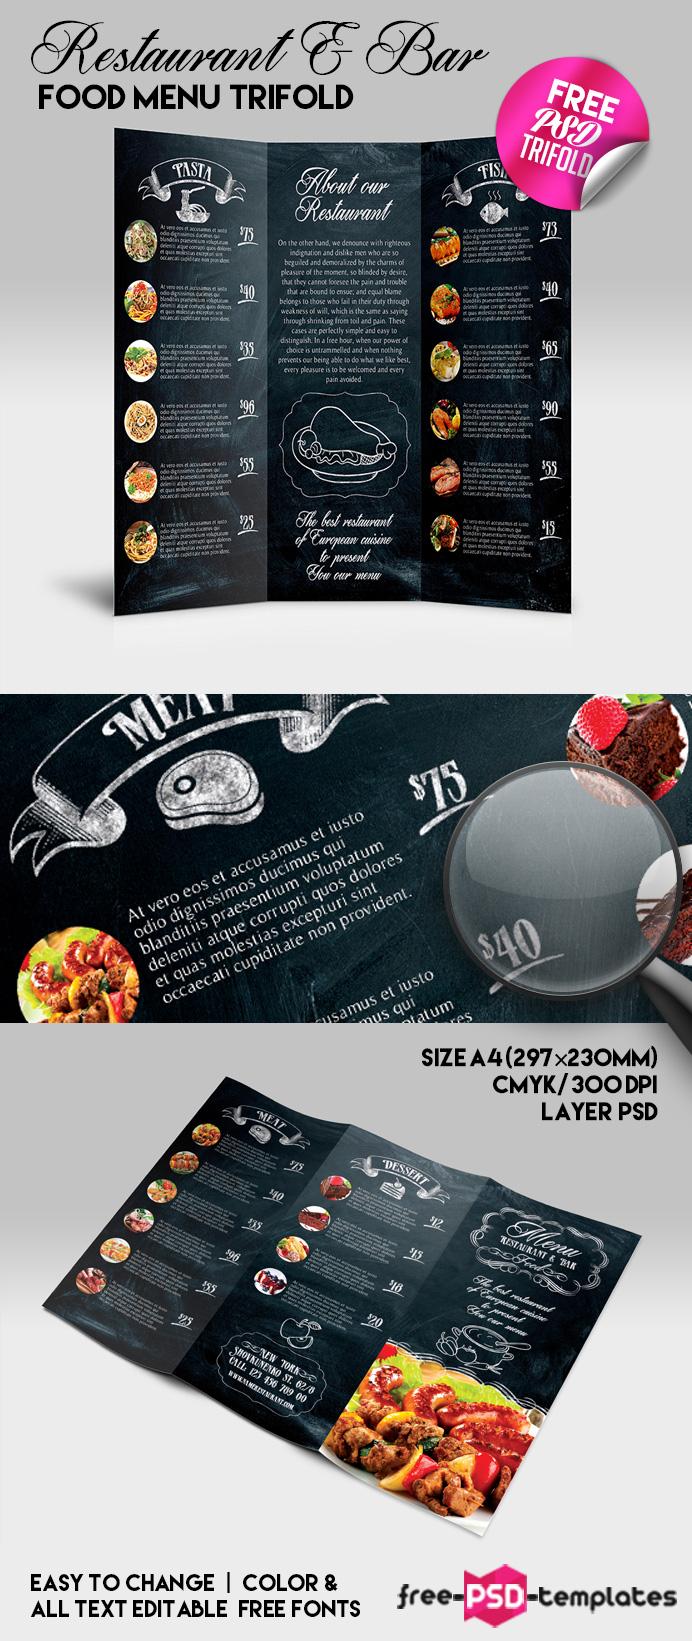 Free Restaurant Bar Food Menu Trifold Free PSD Templates - Menu brochure template free